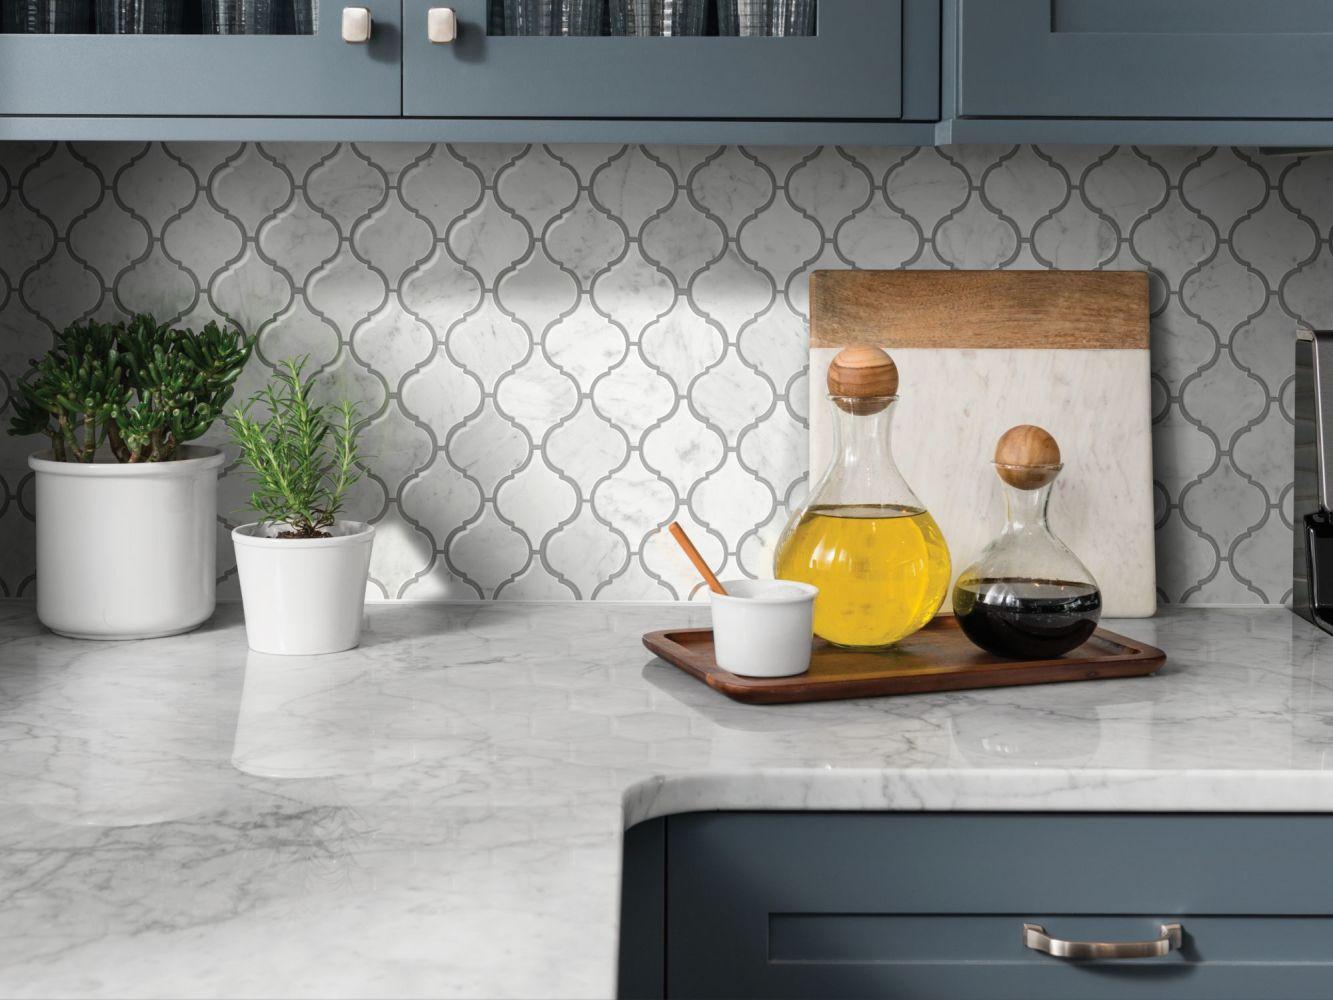 Shaw Floors Home Fn Gold Ceramic Estate Lantern Mosaic Bianco Carrara 00150_TGN86